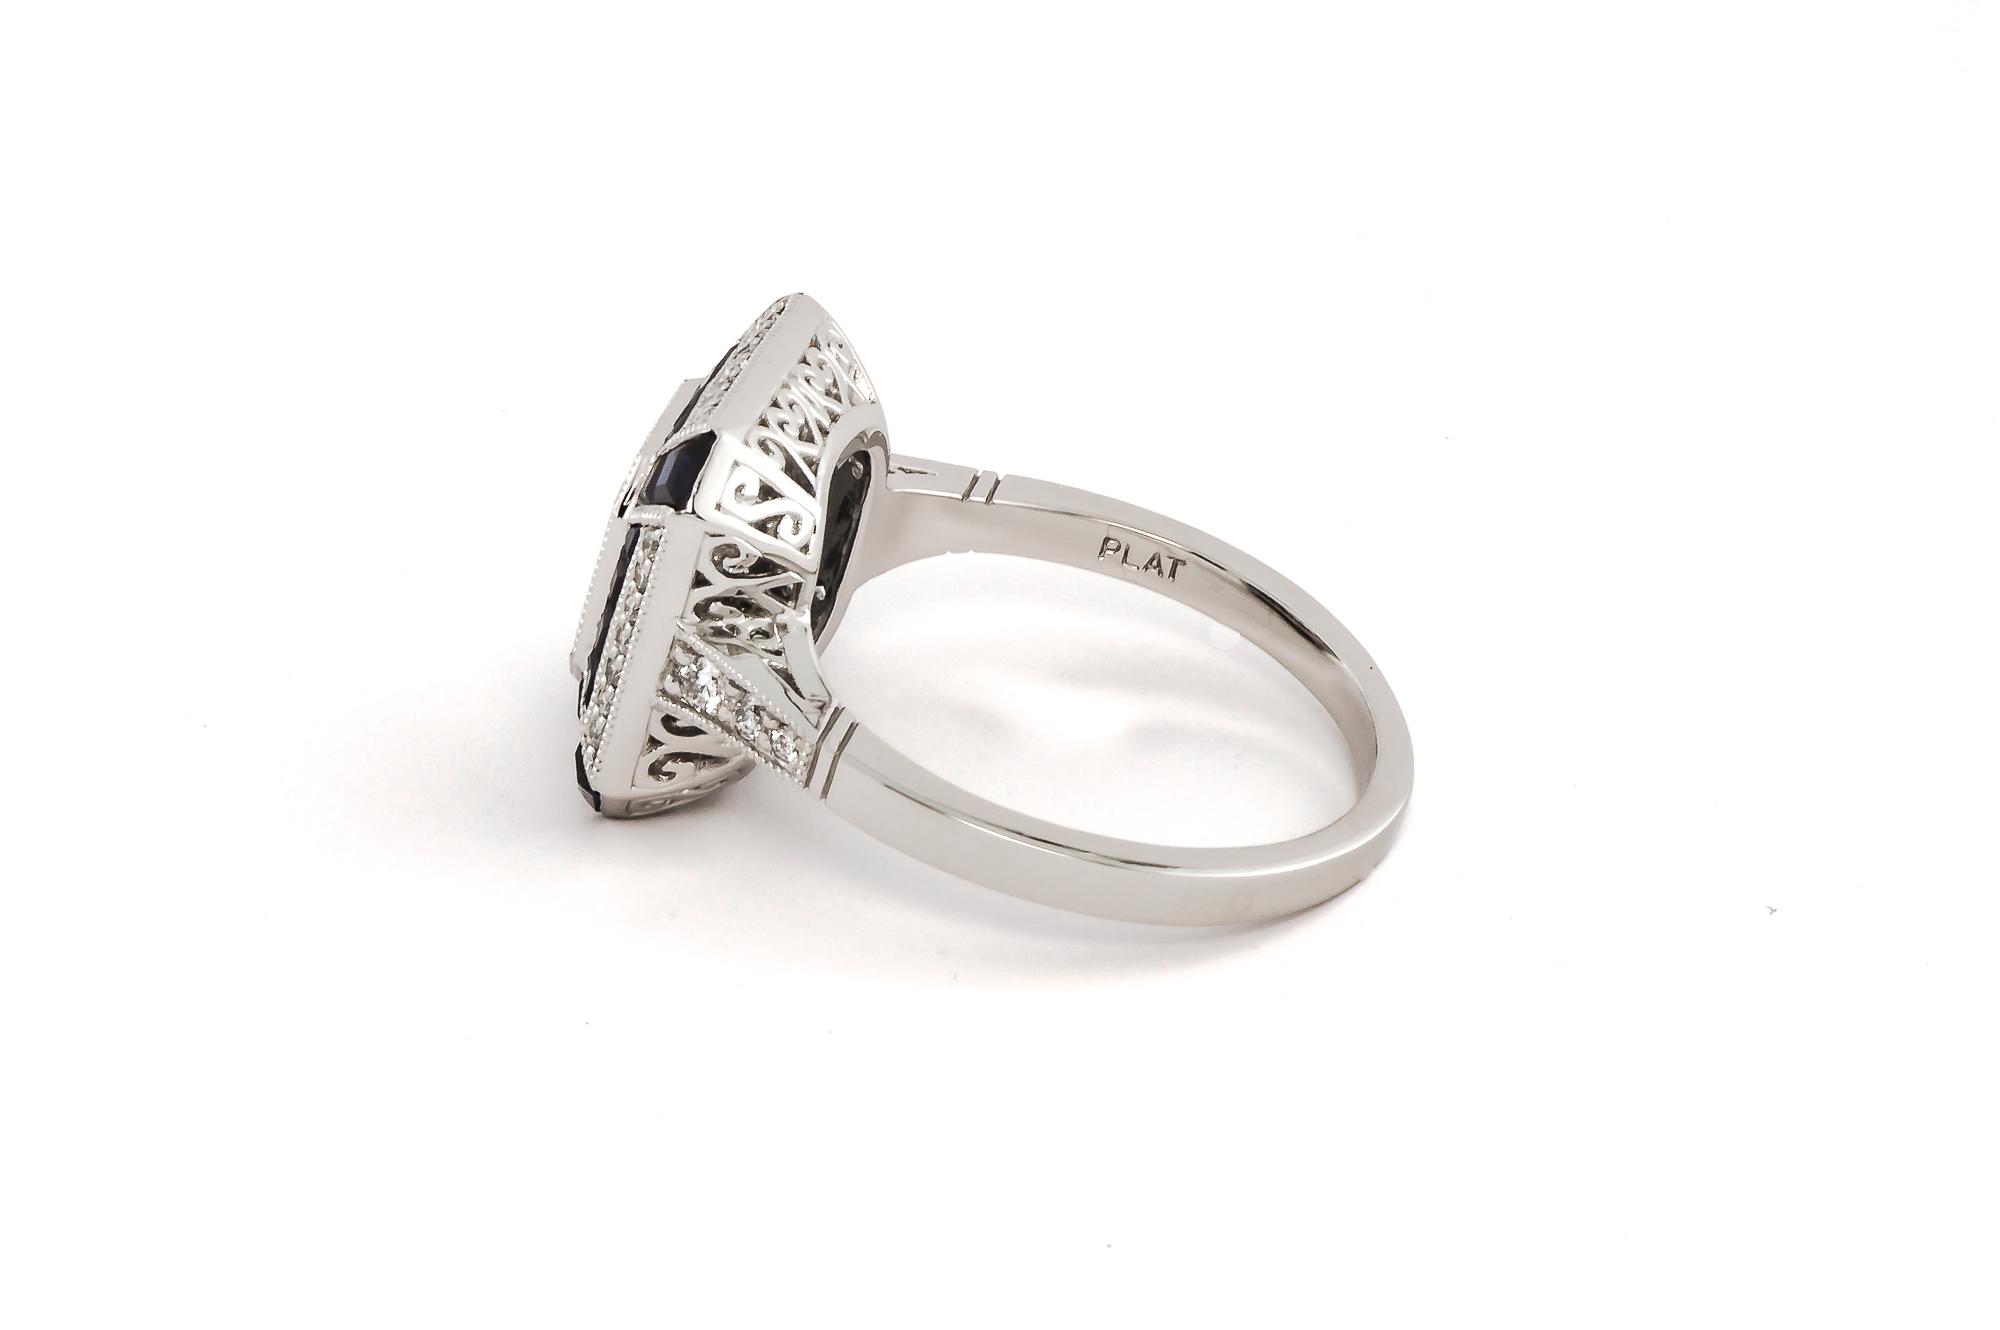 sapphire ring-4.jpg